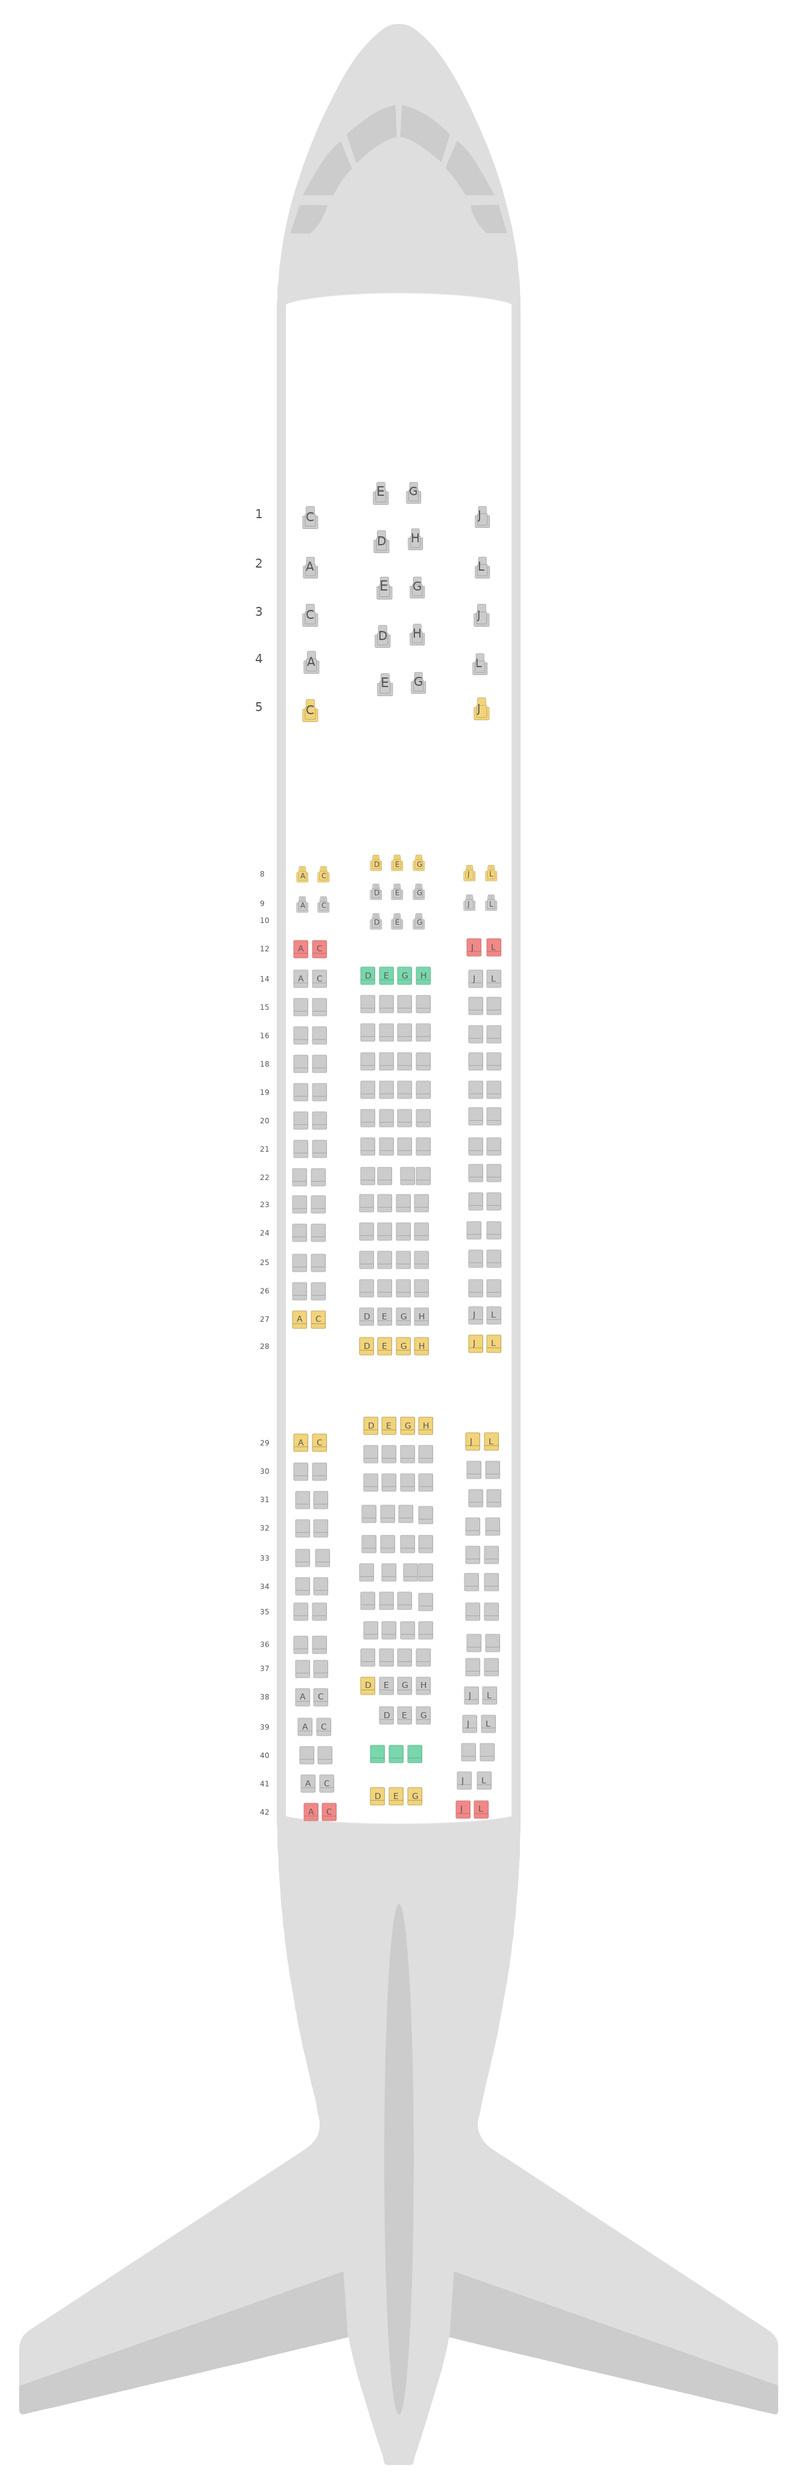 Sitzplan Airbus A330-200 (332) 2 Class Alitalia